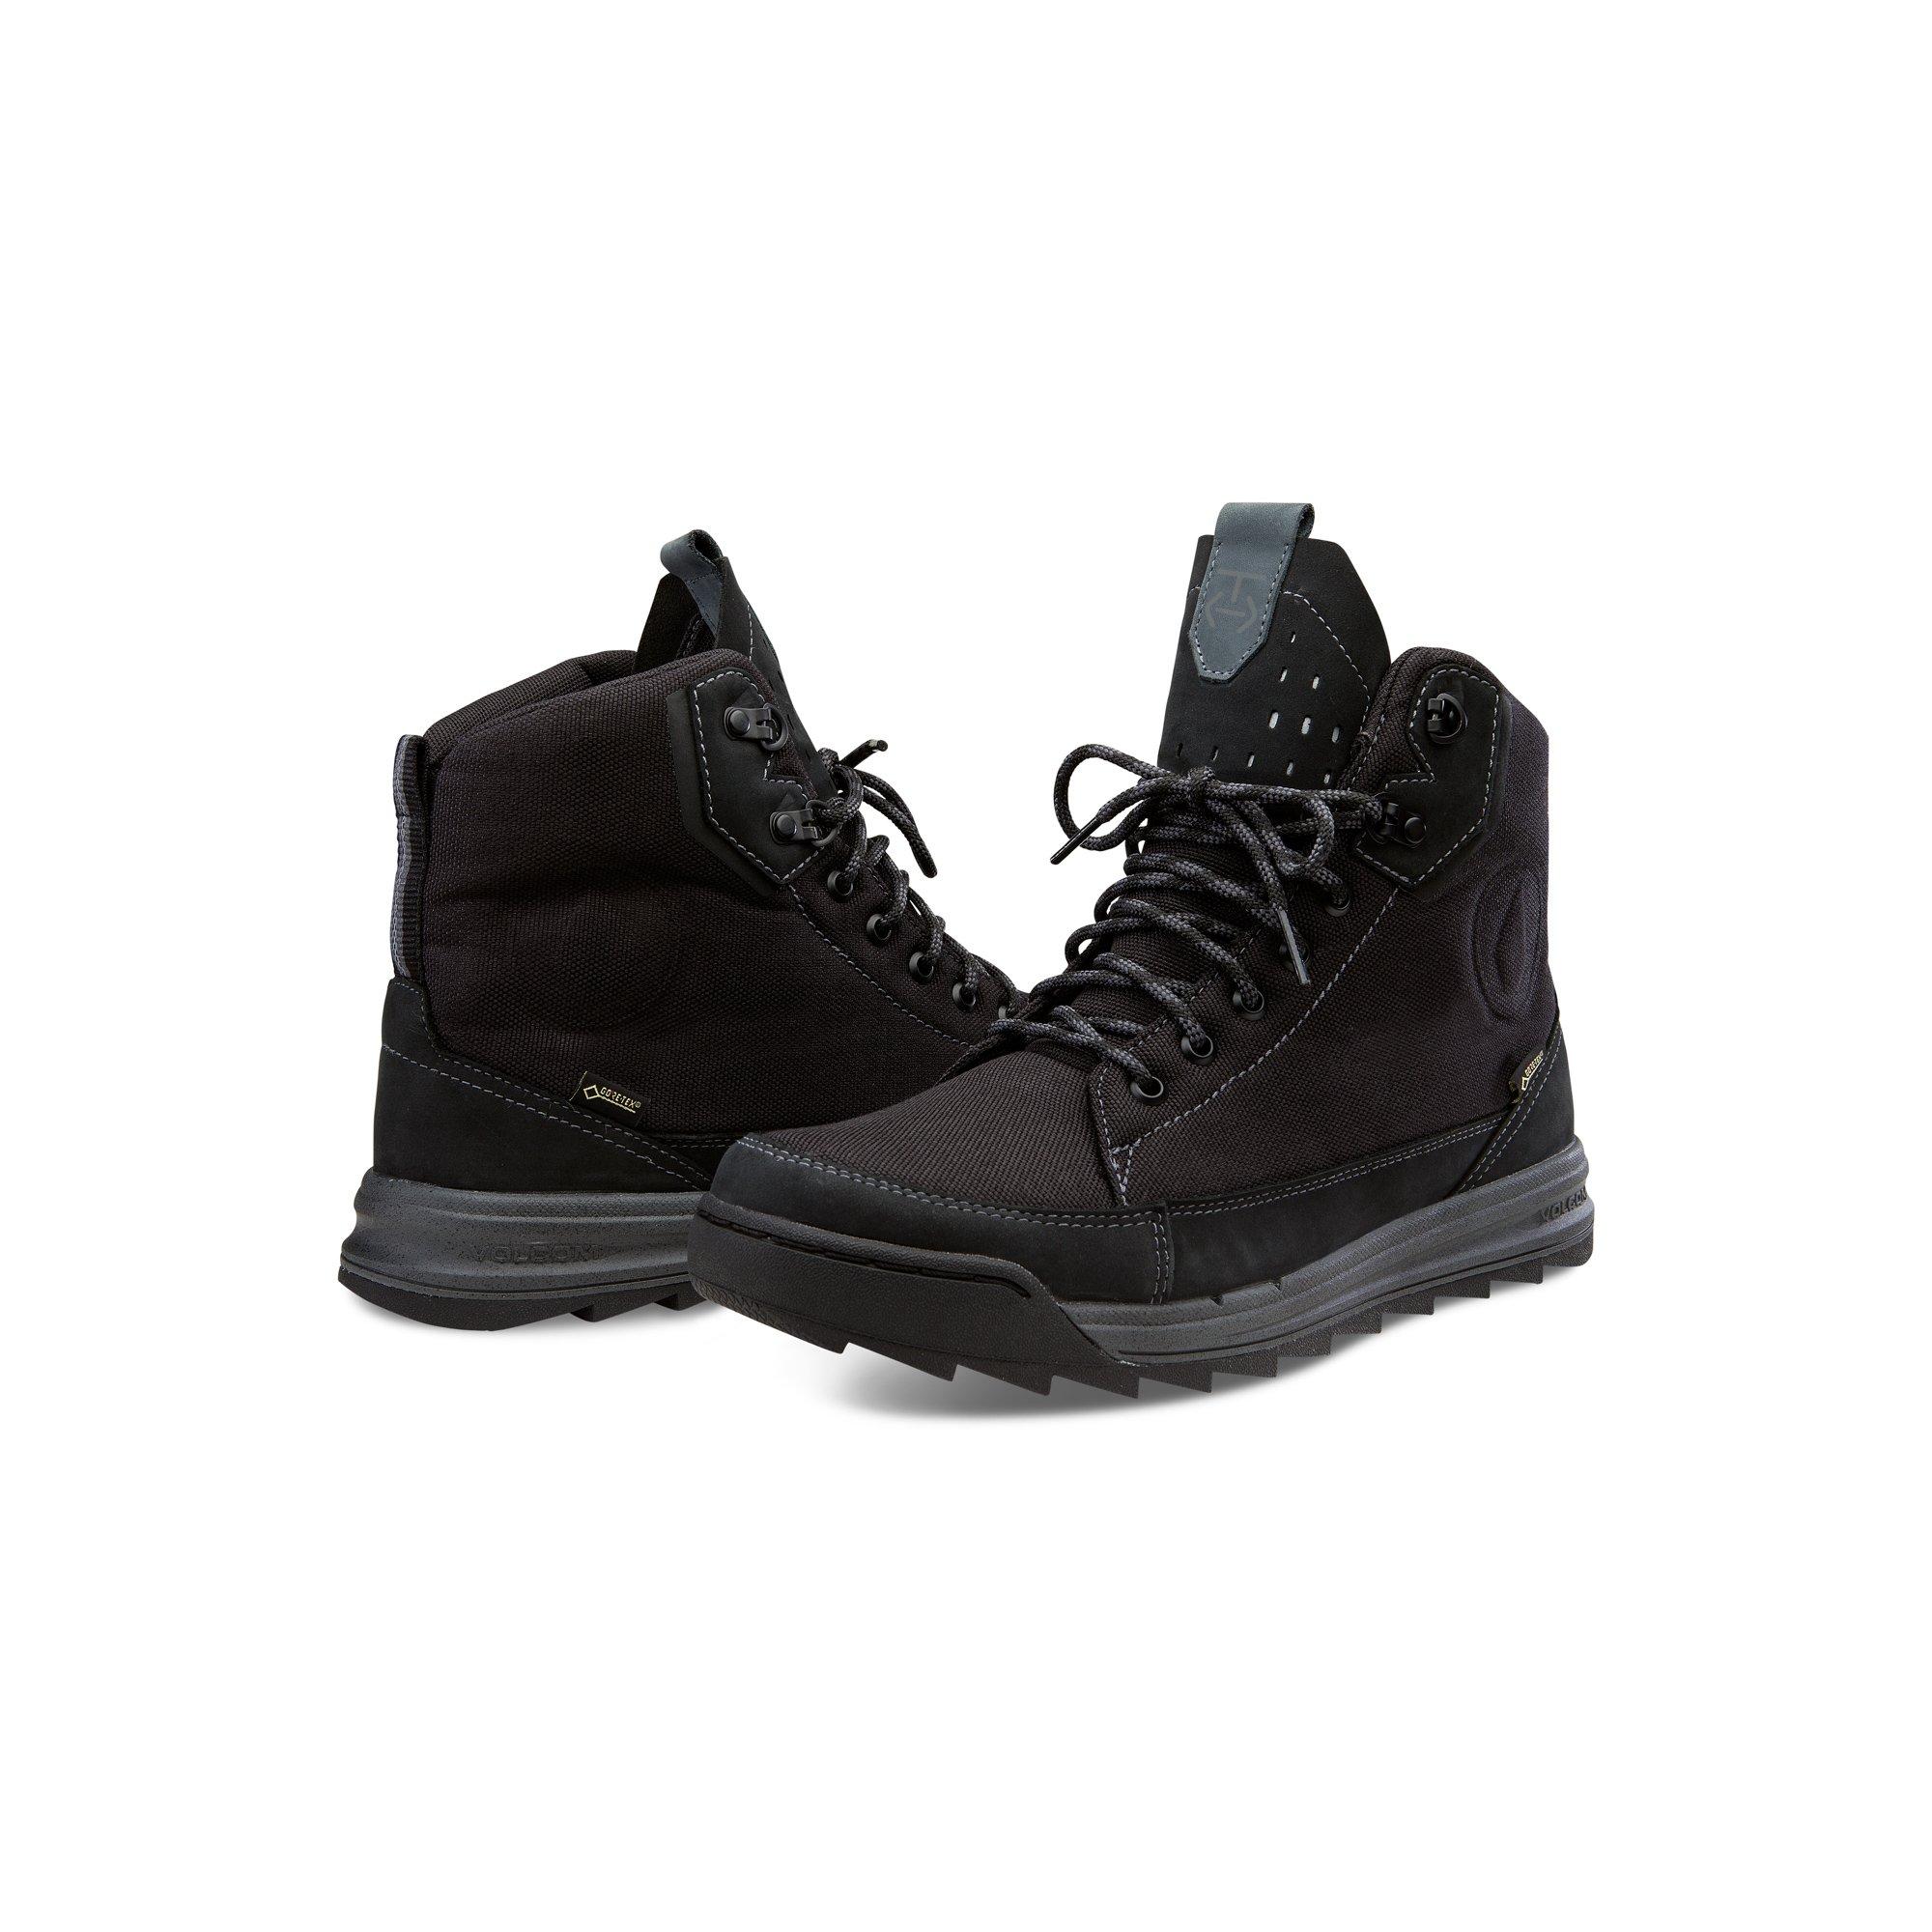 Volcom Men's Roughington GTX Boot Winter, New Black, 8 US/8 D US